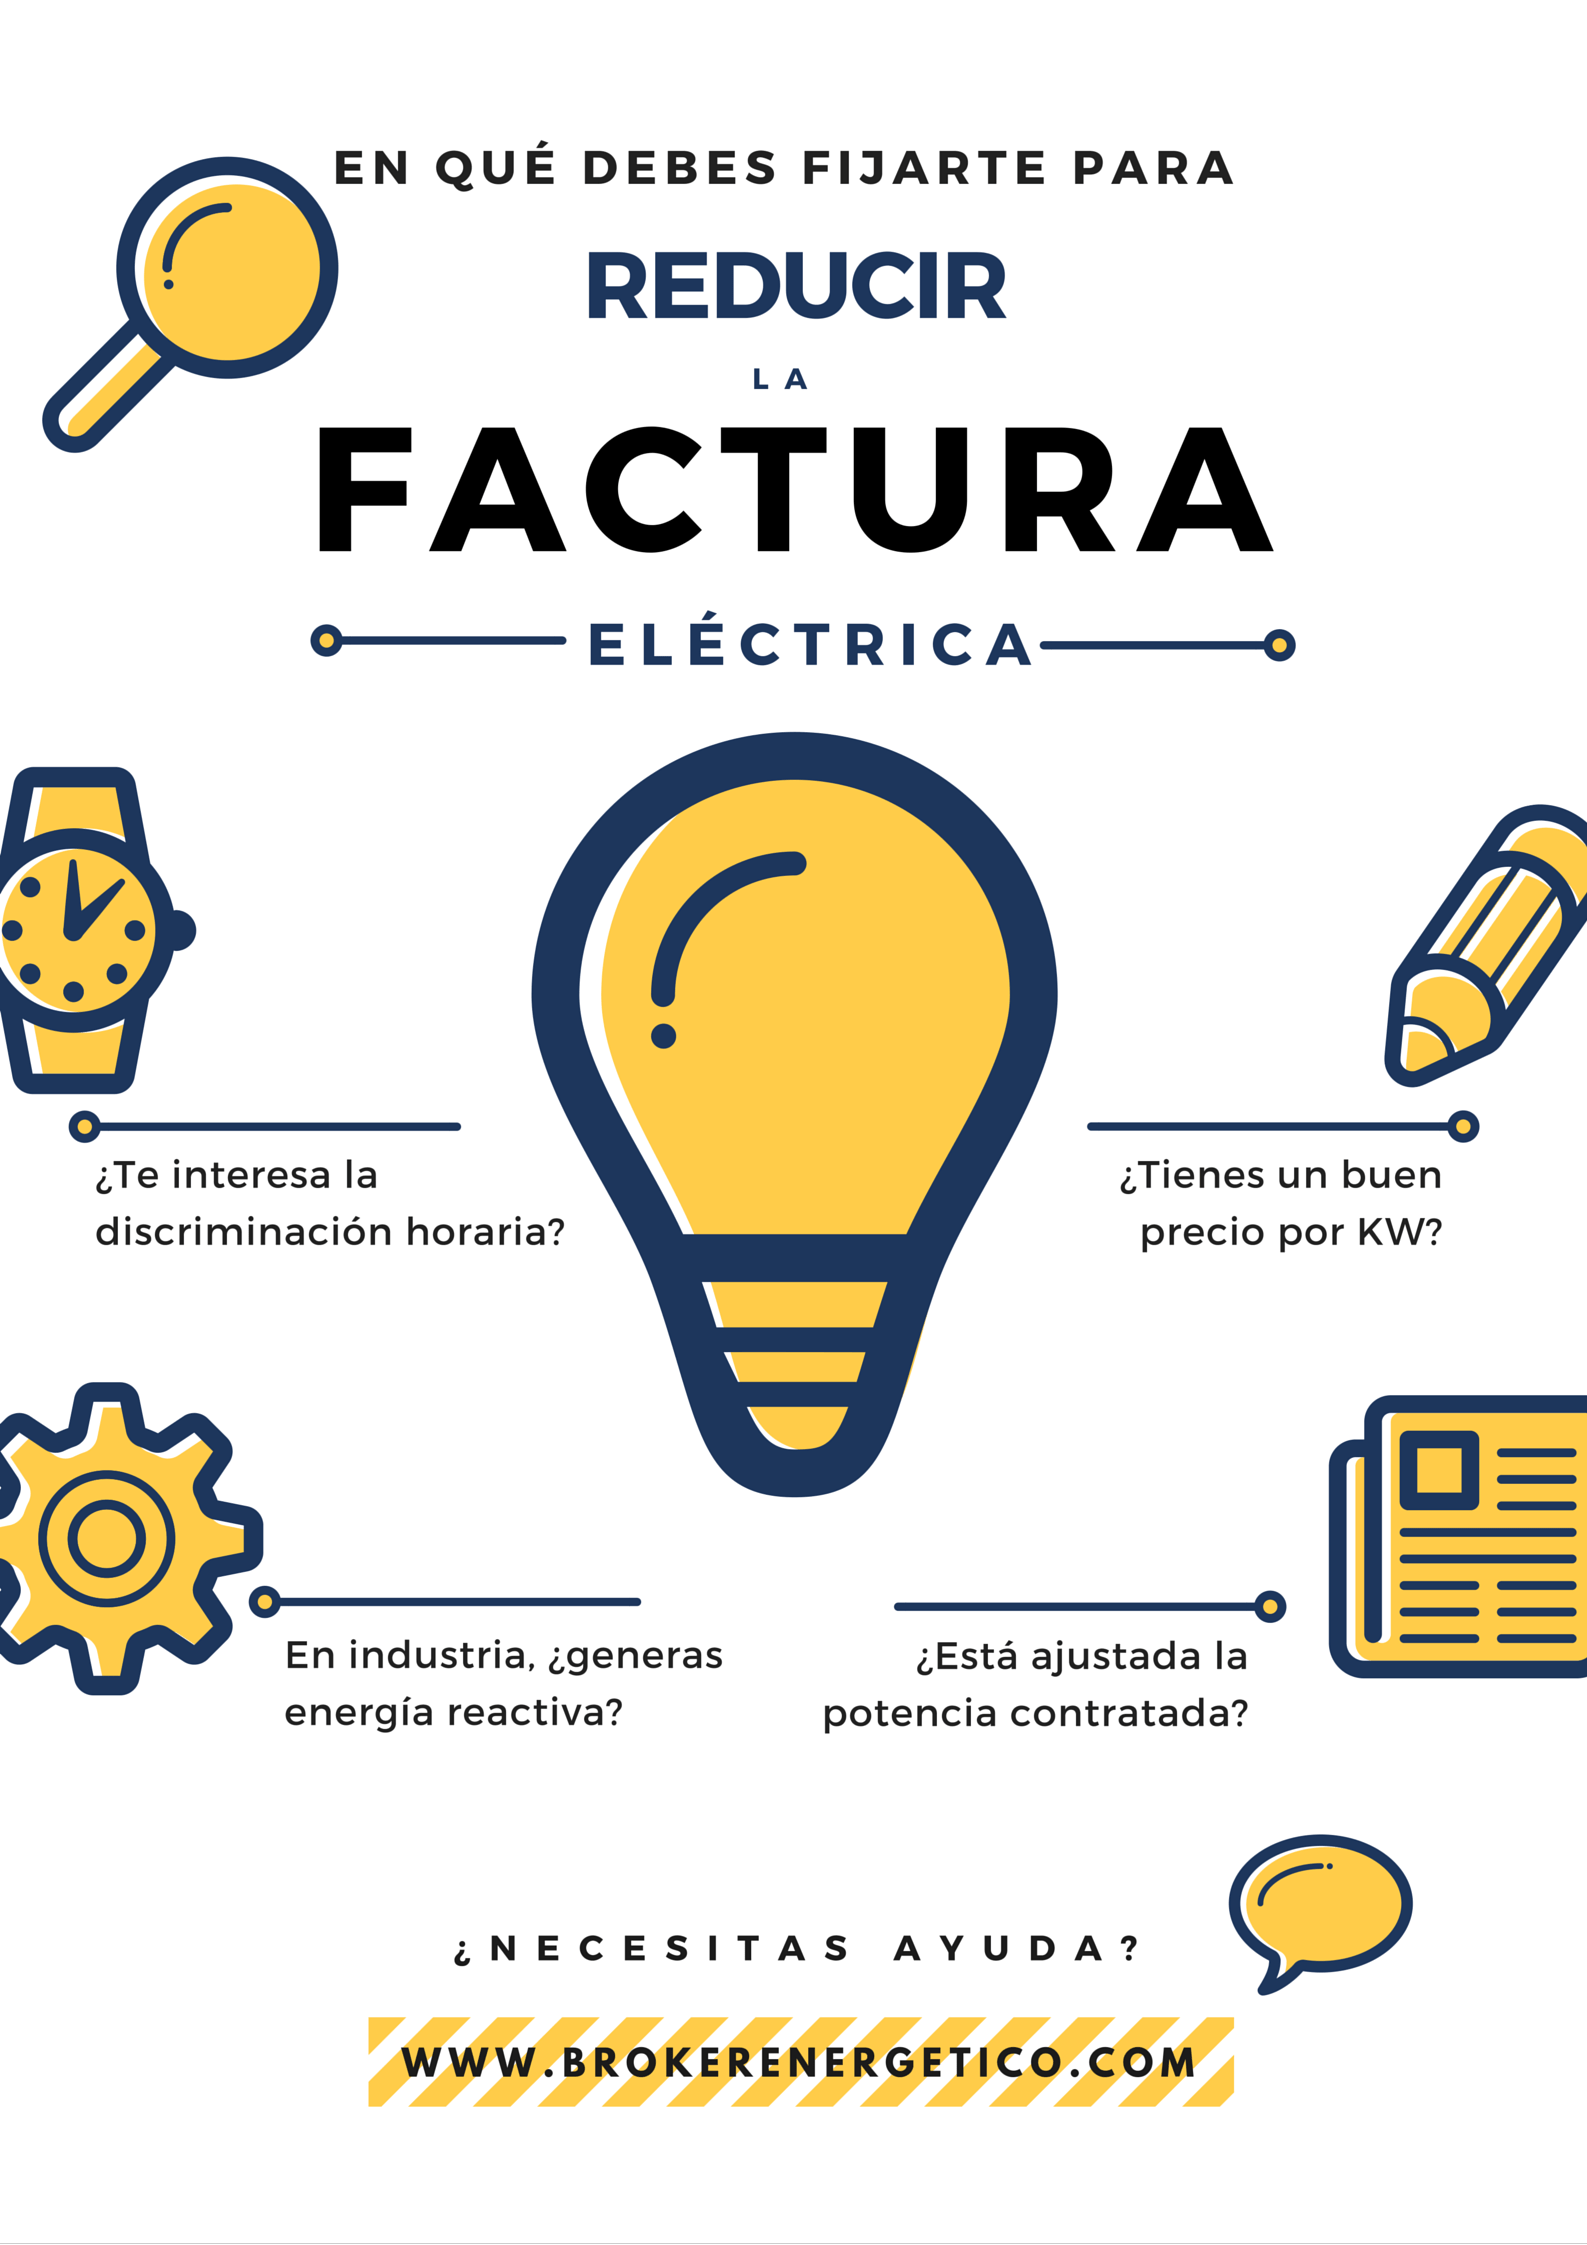 infografia reducir la factura eléctrica